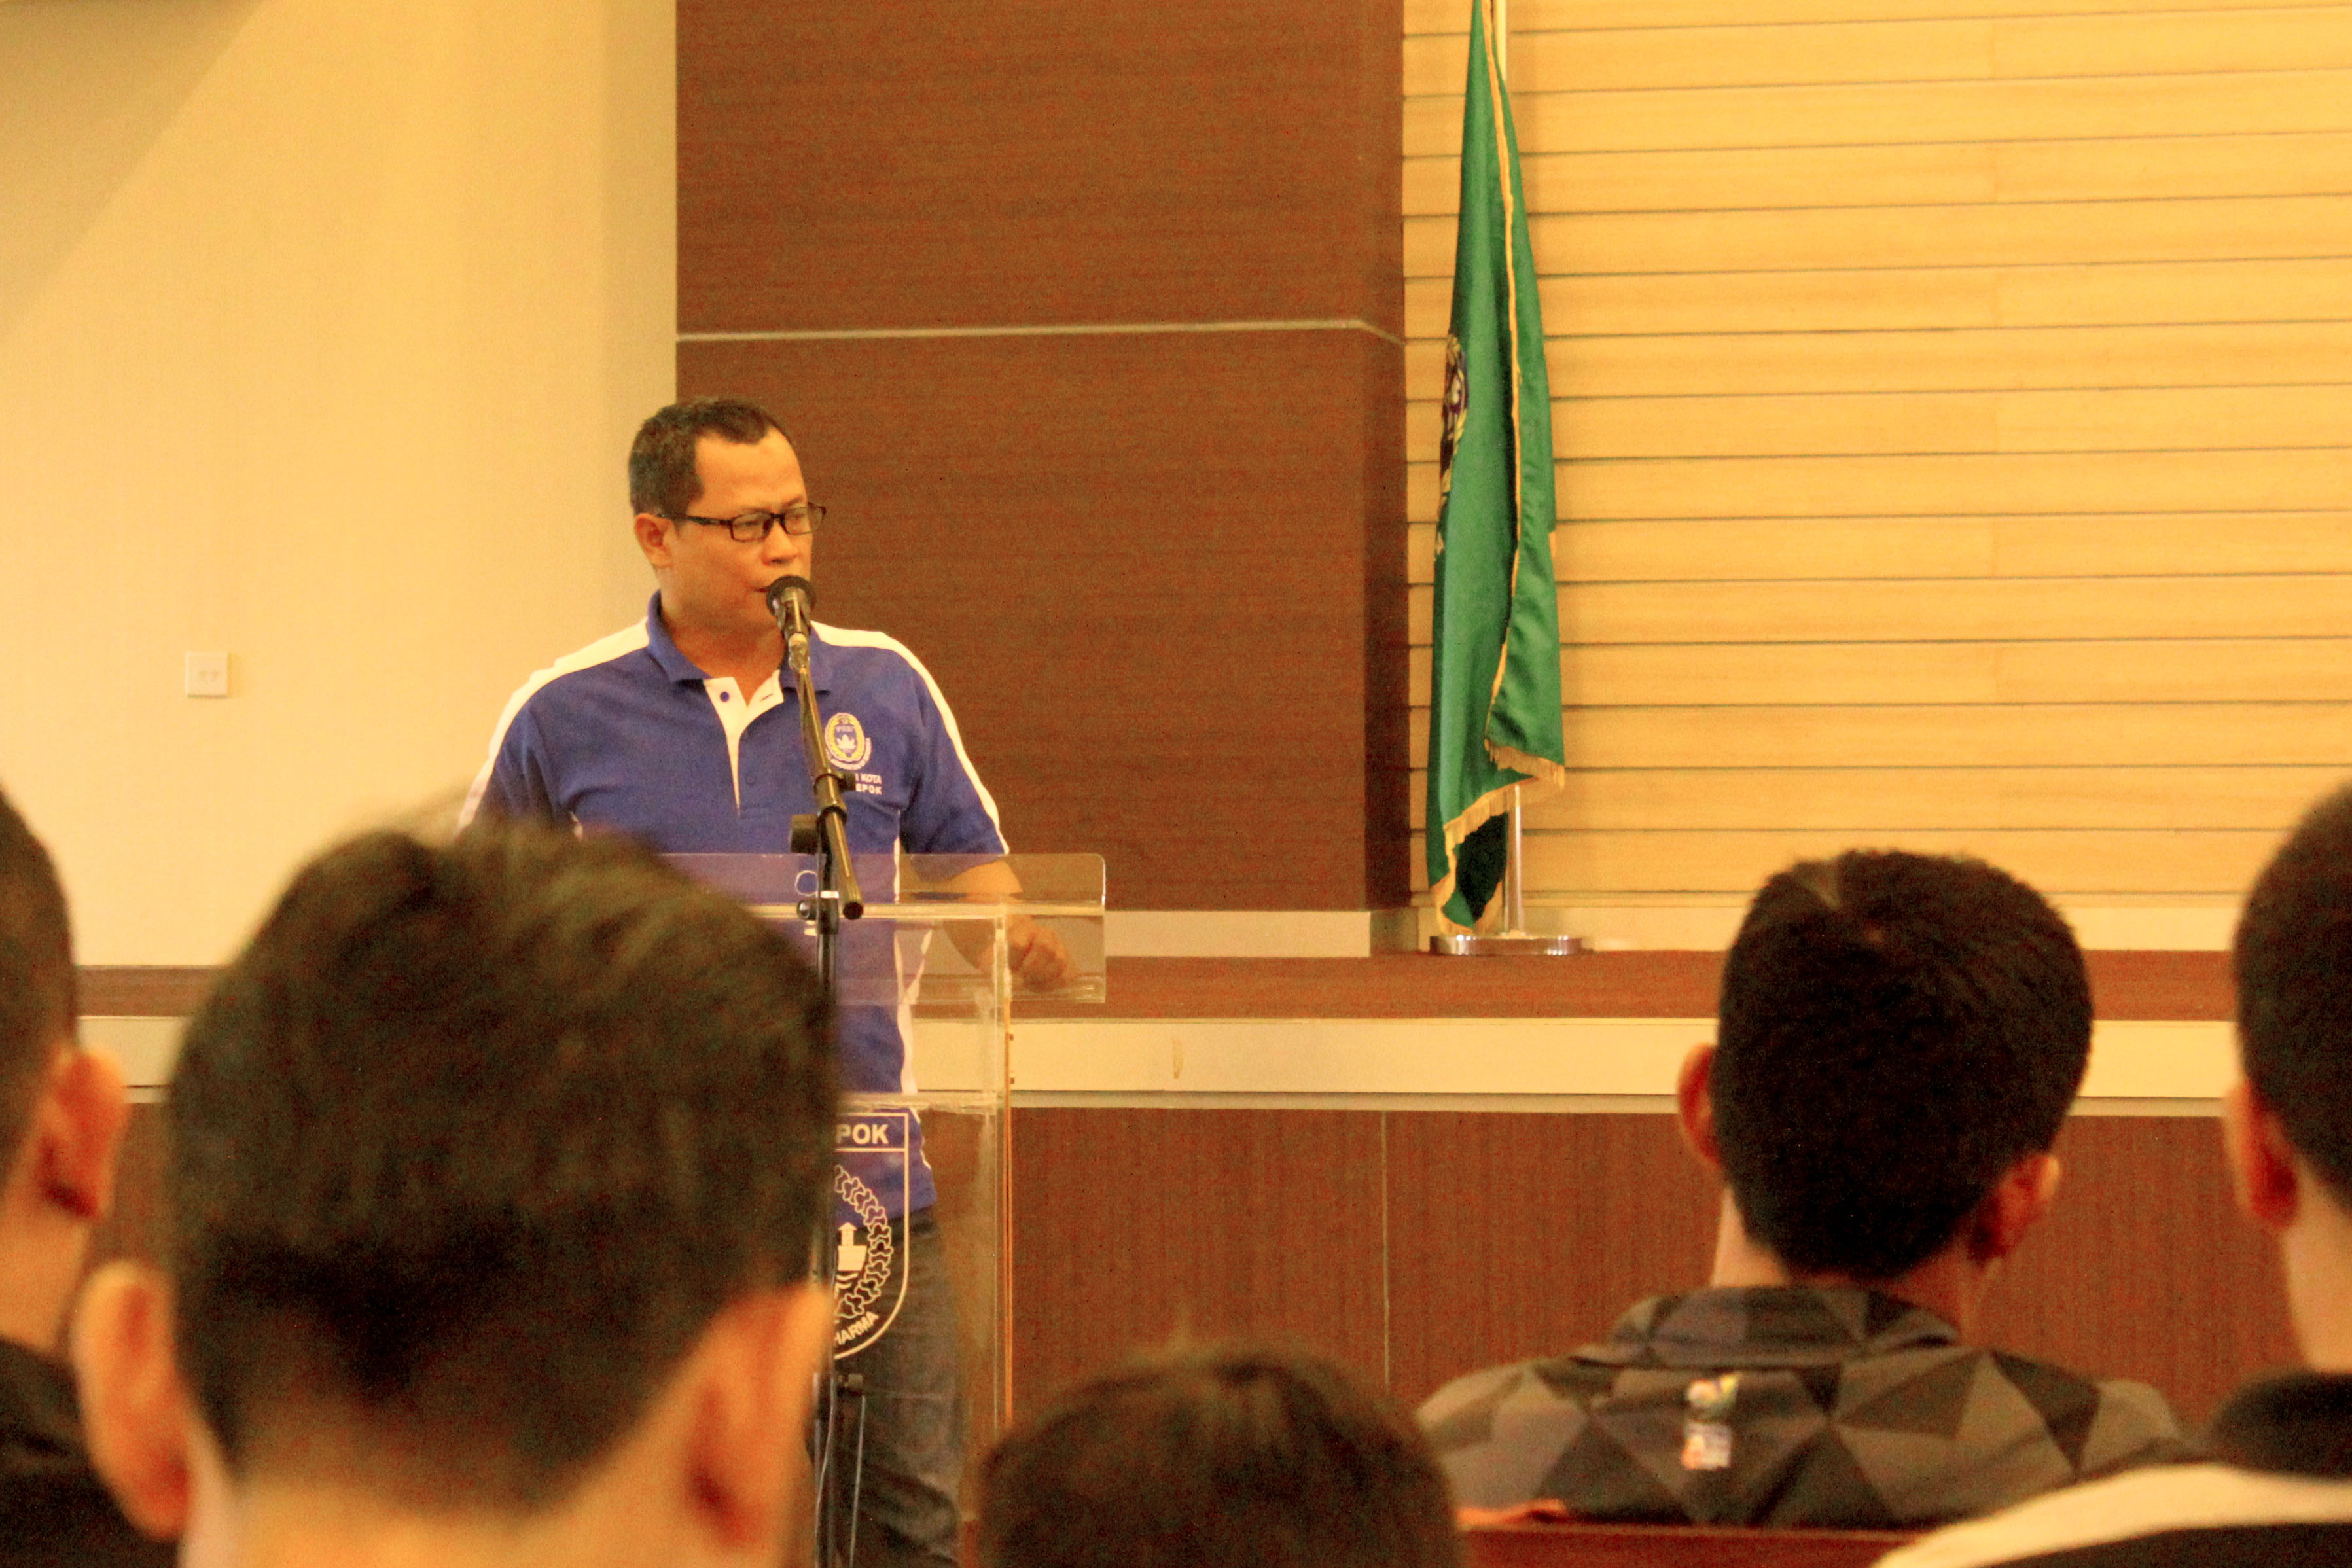 Meiyadi ketua askot PSSI Kota Depok menyempatkan hadir untuk memberikan sambutan diacara kongres Asosiasi Futsal kota Depok, di gedung Debaleka LT.10 (19/01/19).